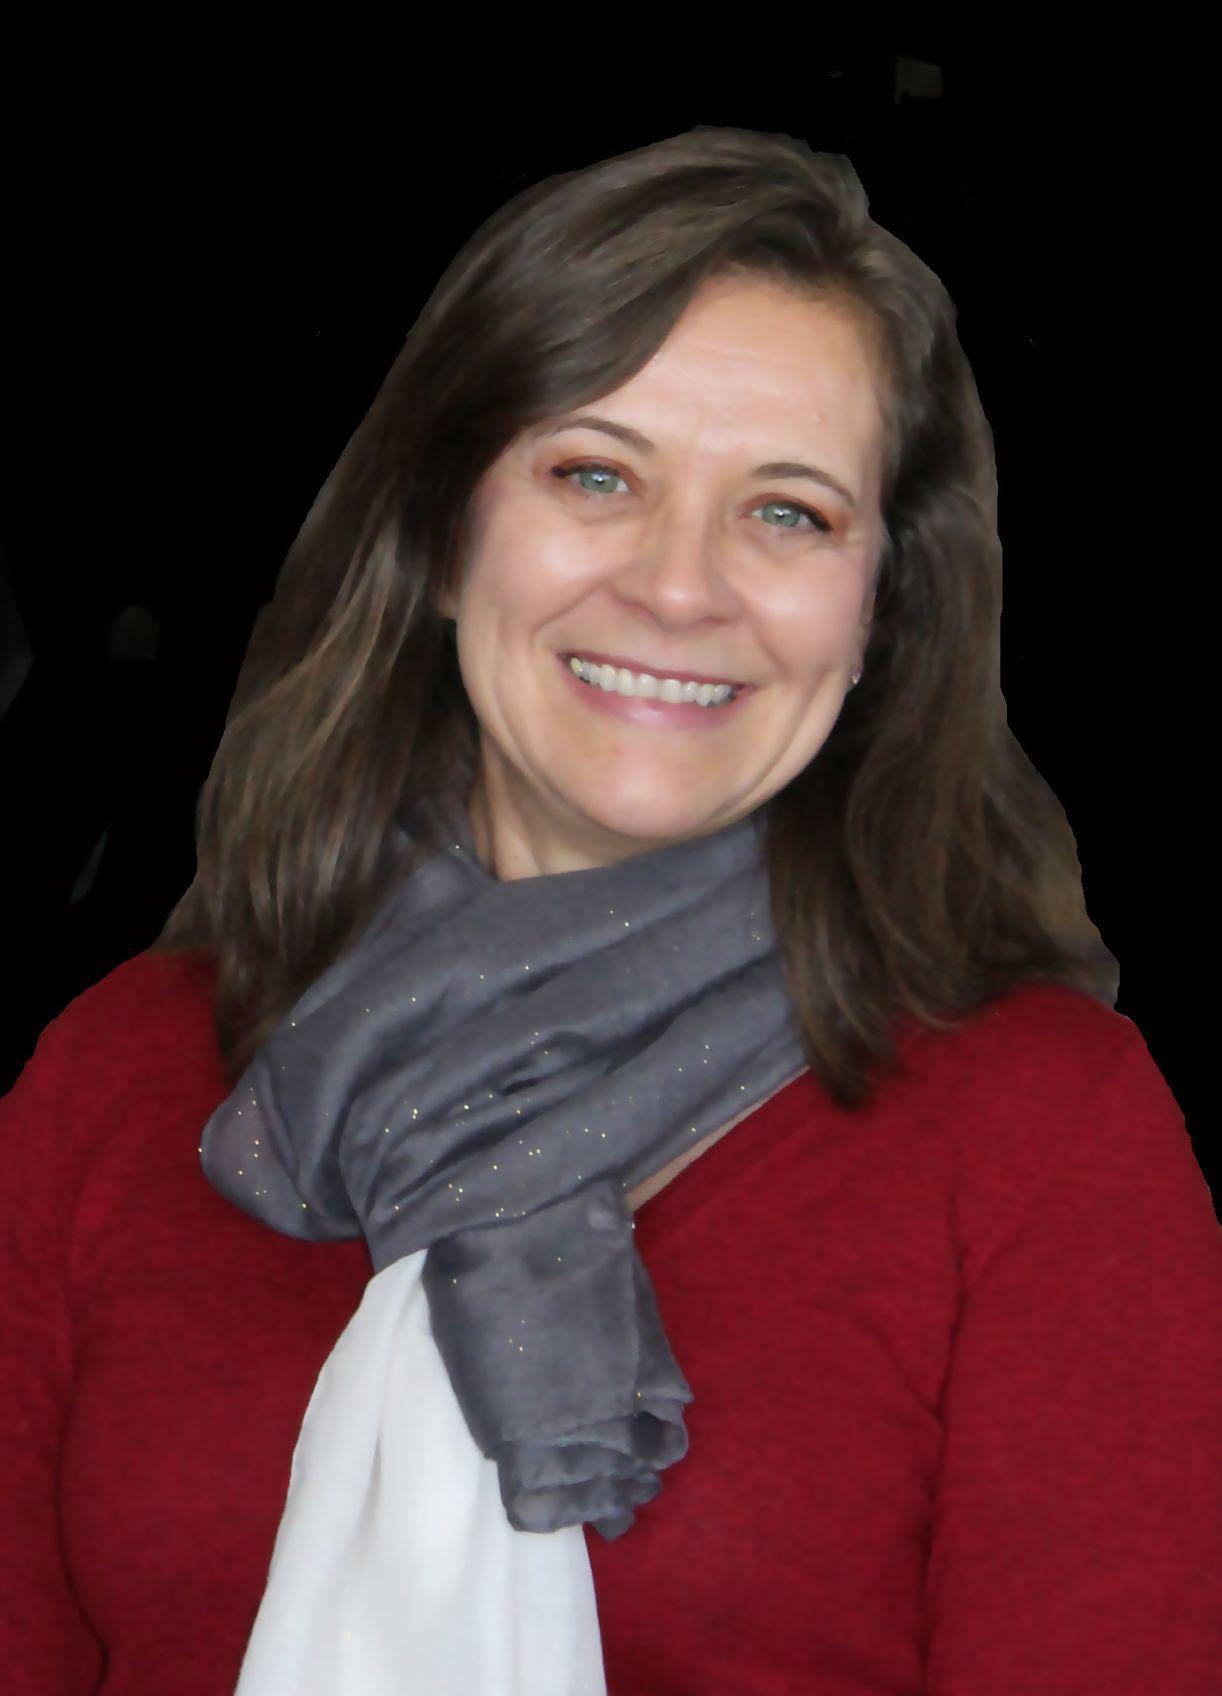 Lori Belknap